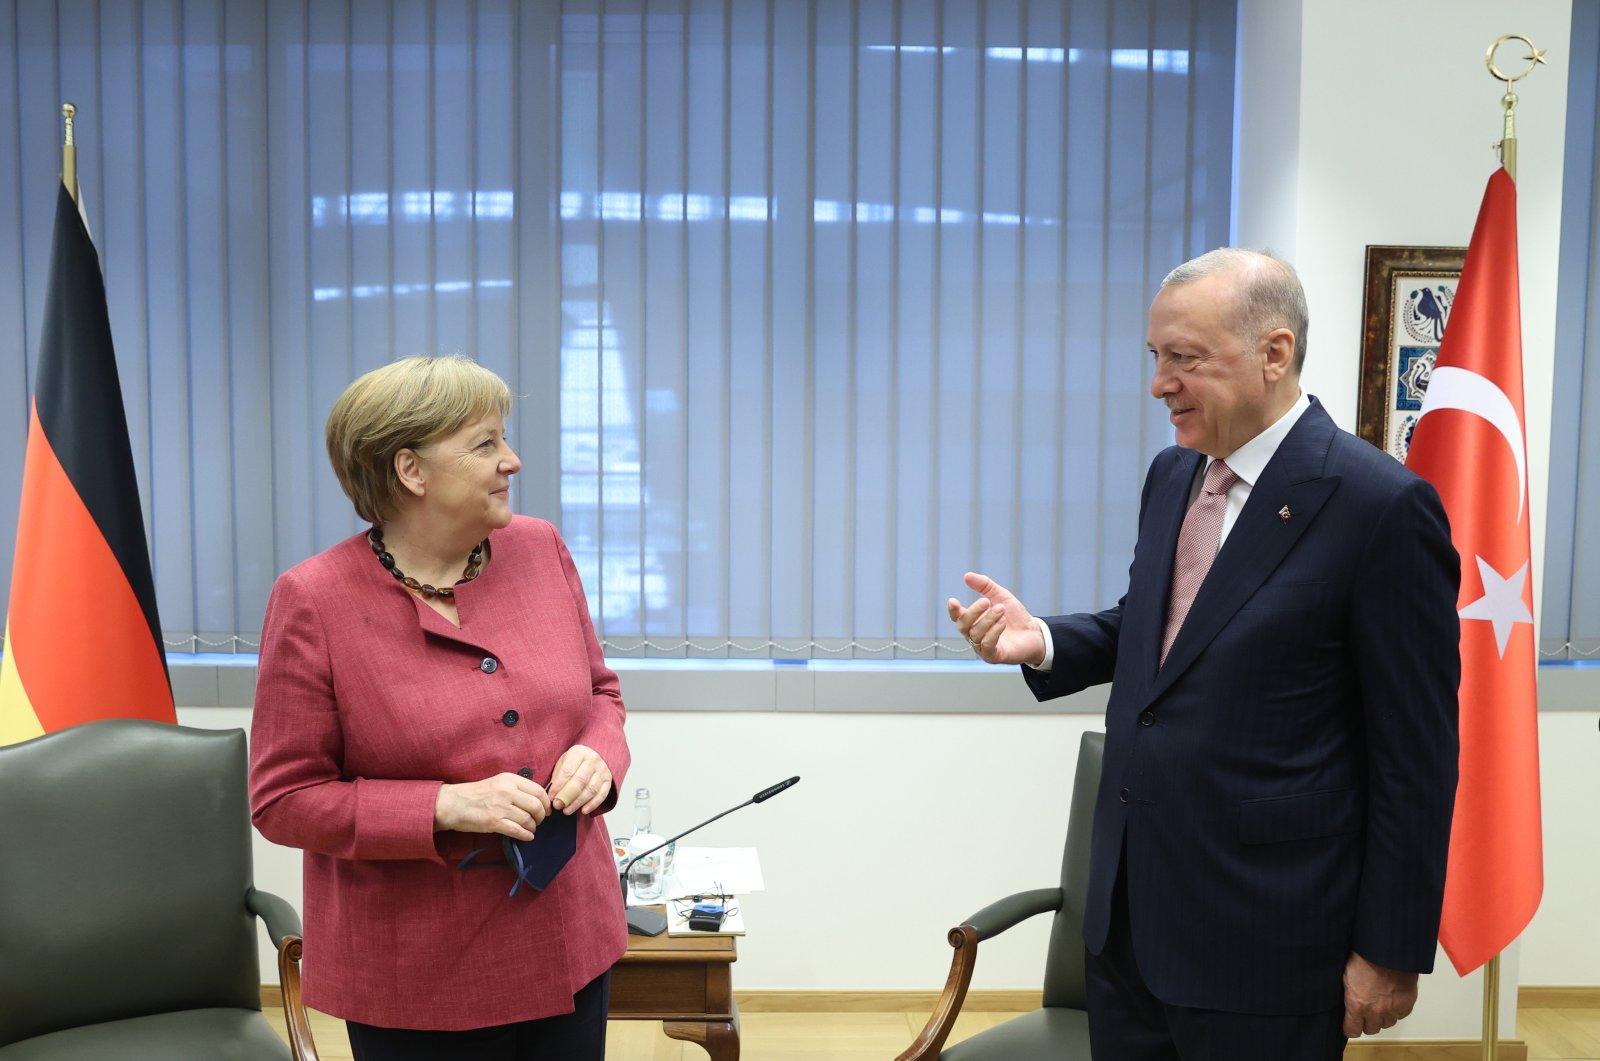 President Recep Tayyip Erdoğan and German Chancellor Angela Merkel gesture during a meeting on the sidelines of NATO meeting in Brussels, June 15, 2021. (AA Photo)